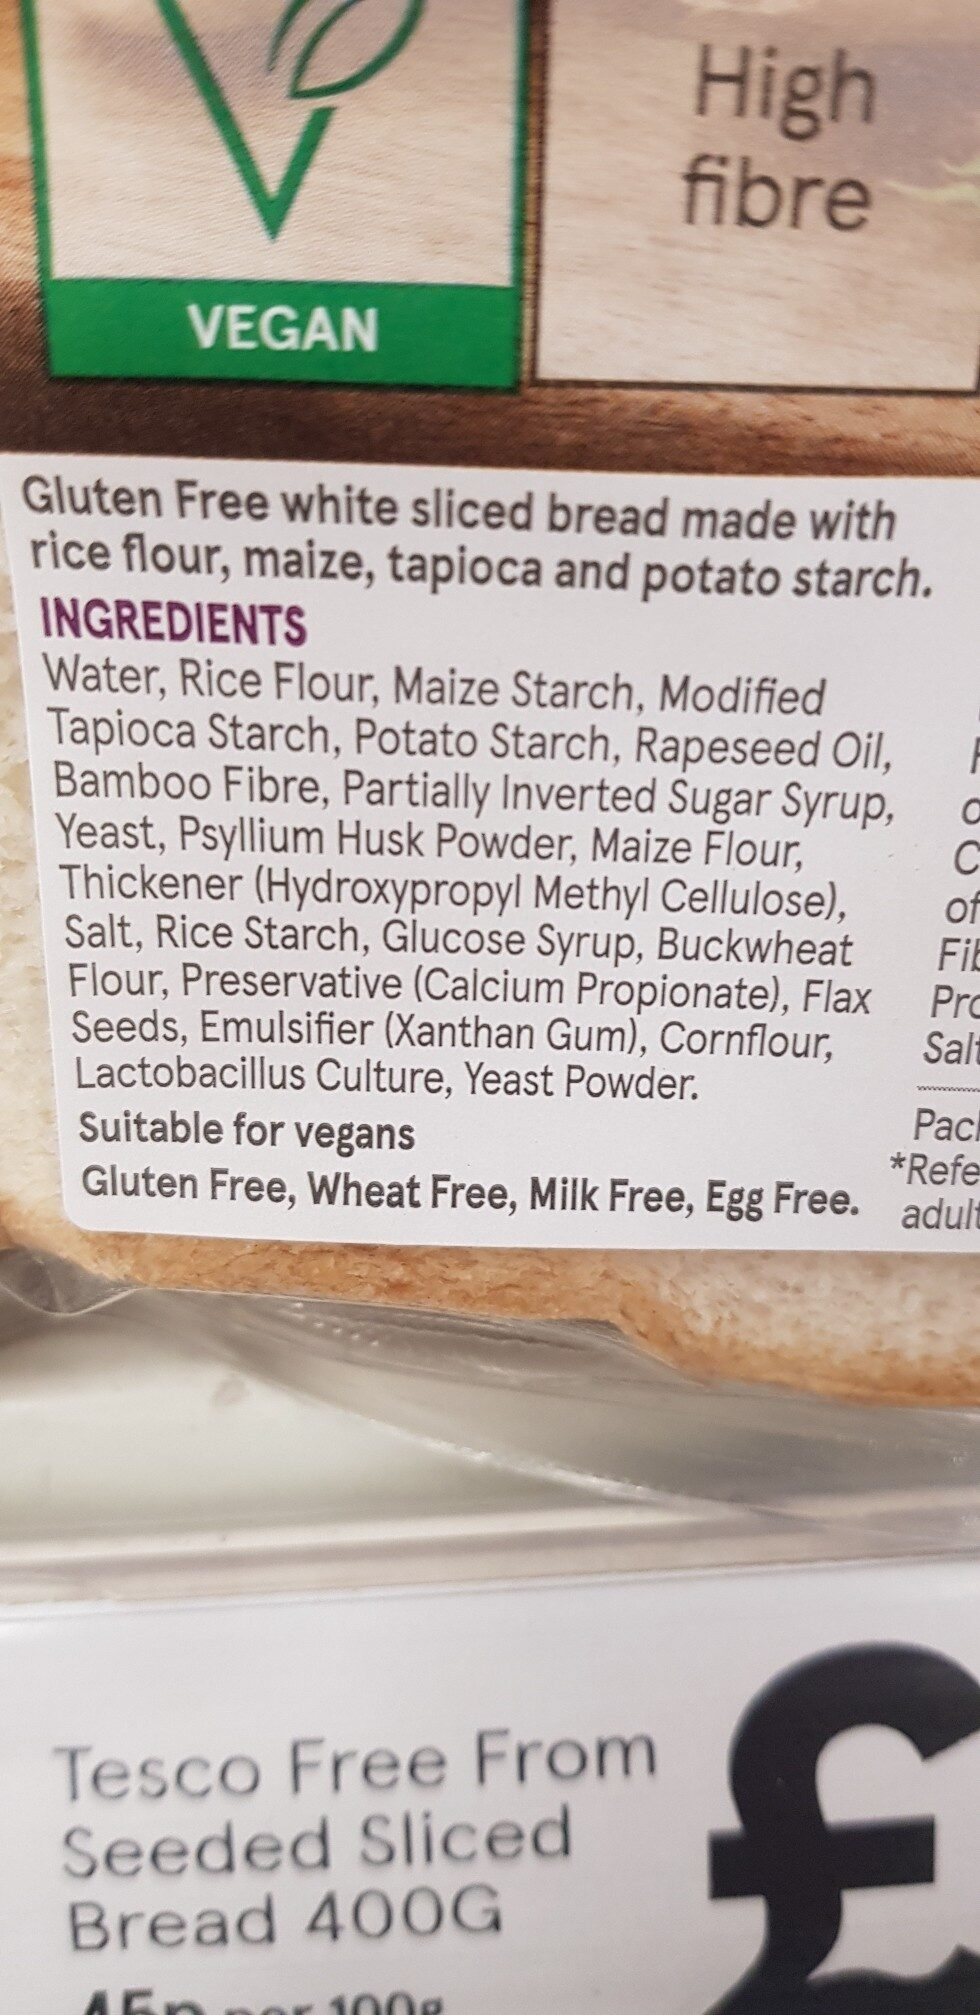 Tesco Free From White Sliced Bread 400G - Ingredients - en